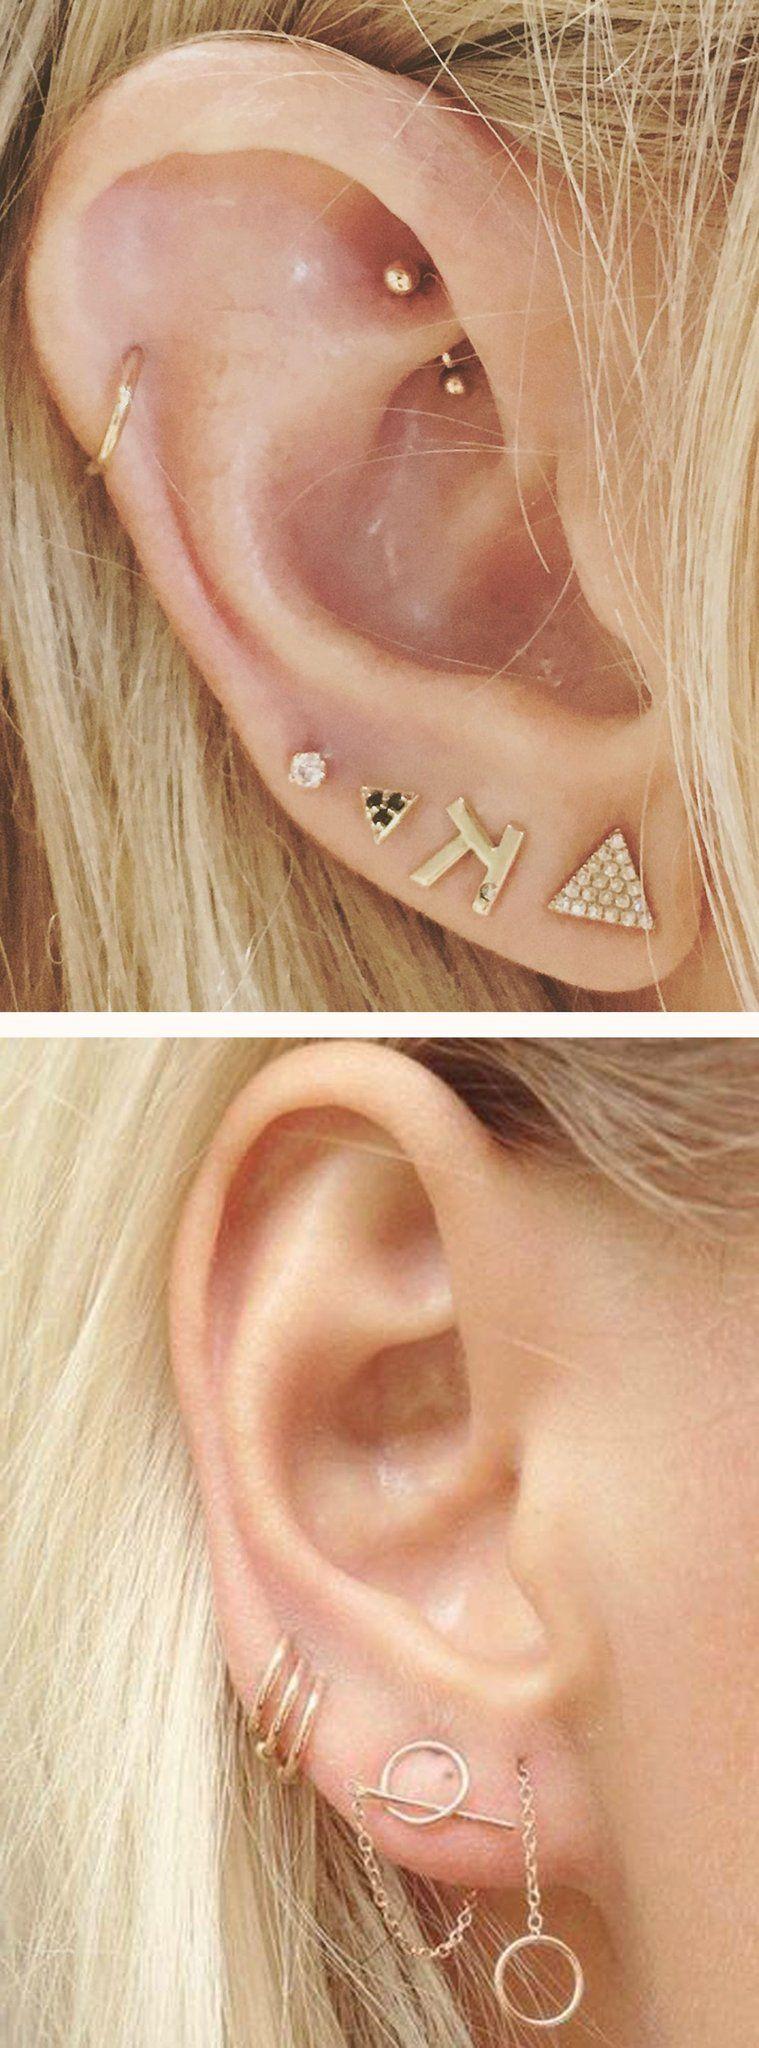 6d2e498ff Dainty Multiple Ear Piercing Ideas Combinations Gold - Cartilage Ring Hoop  Gold - Triple Double Lobe Earring Studs - MyBodiArt.com